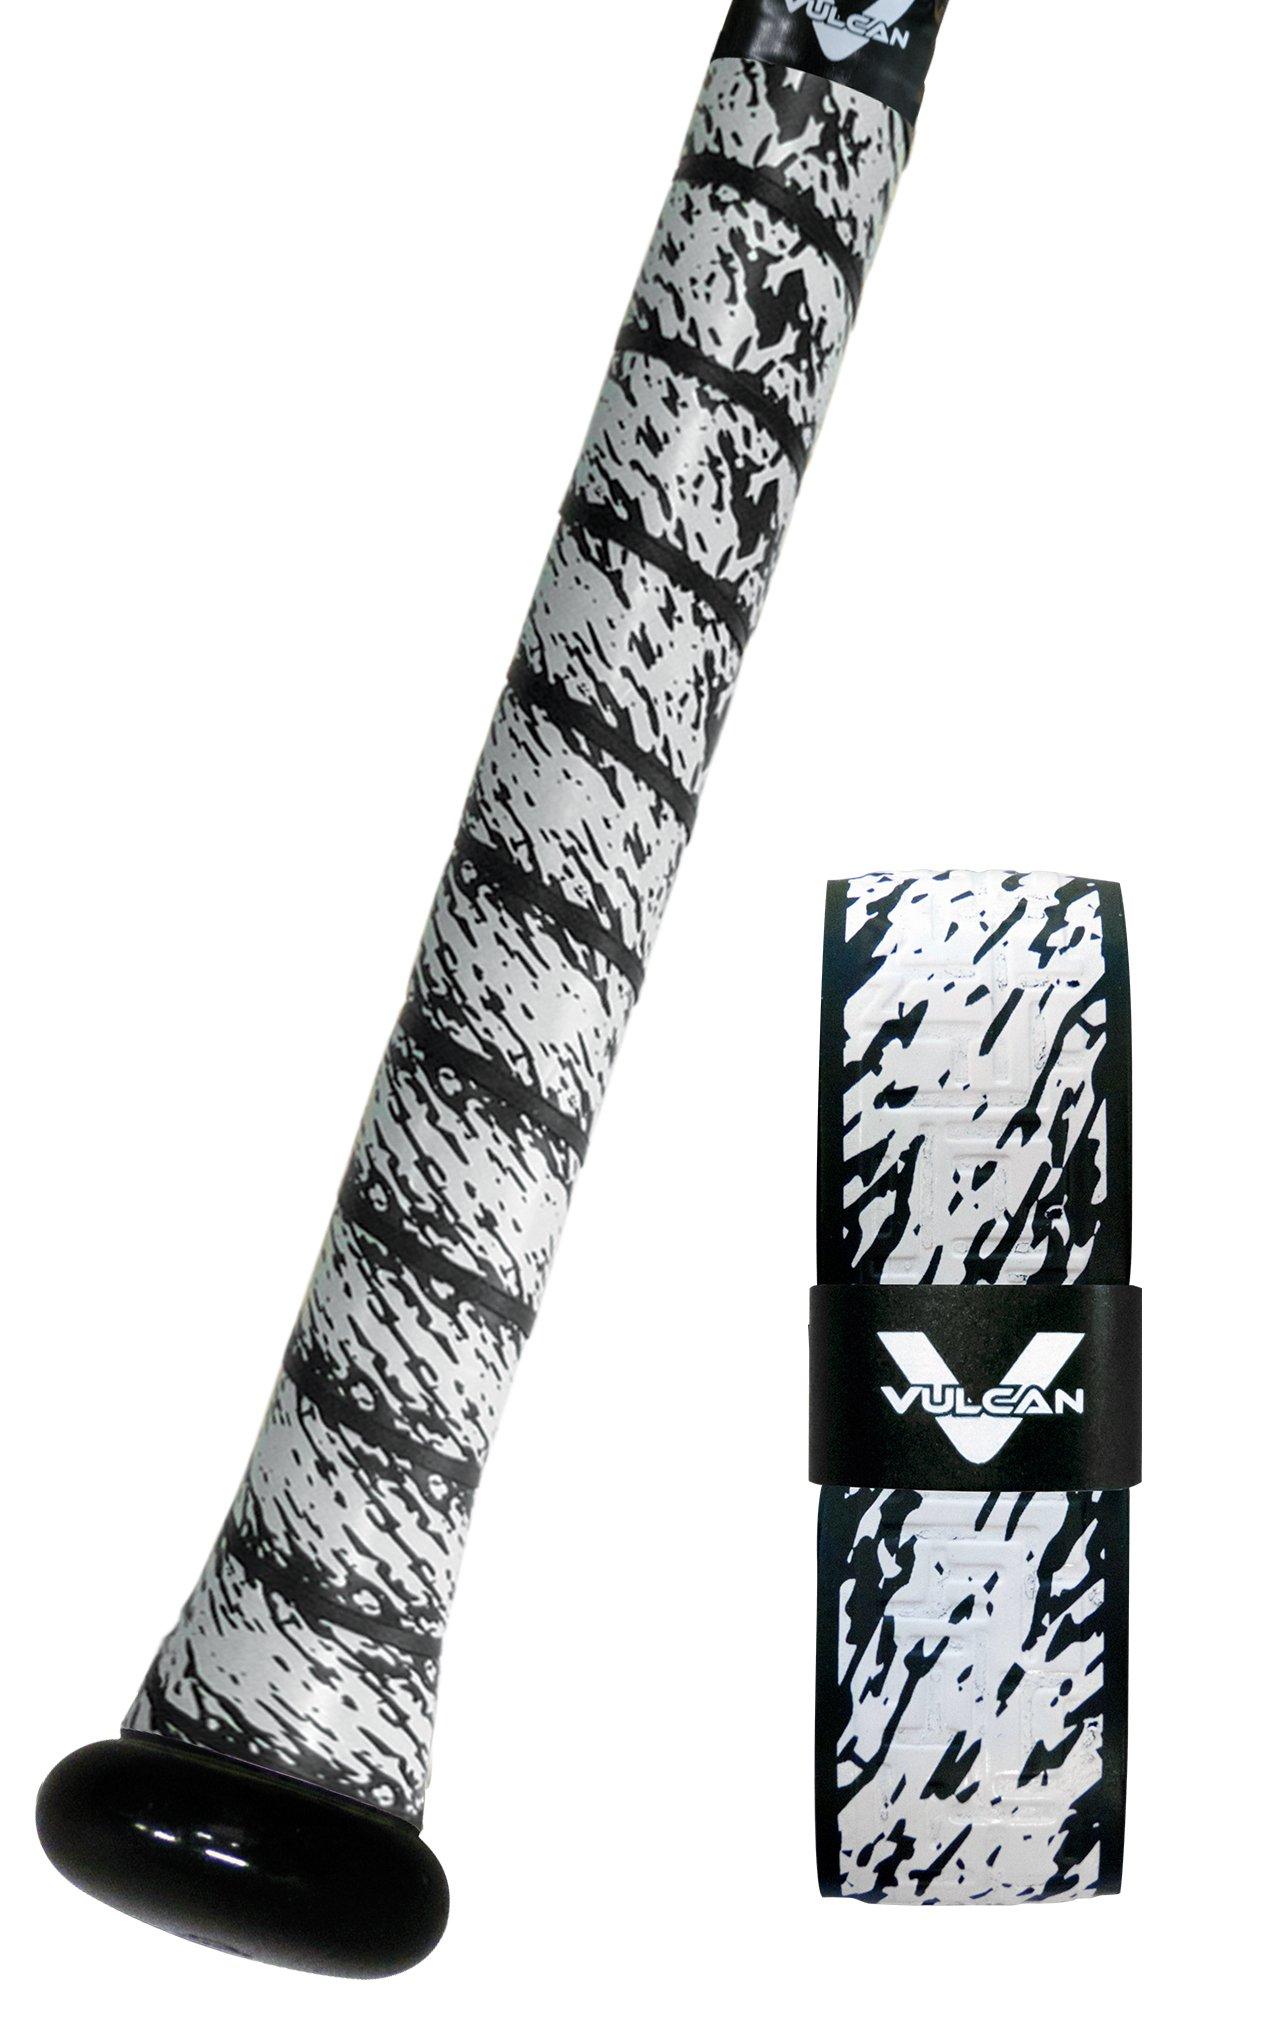 Vulcan Bat Grip by Vulcan